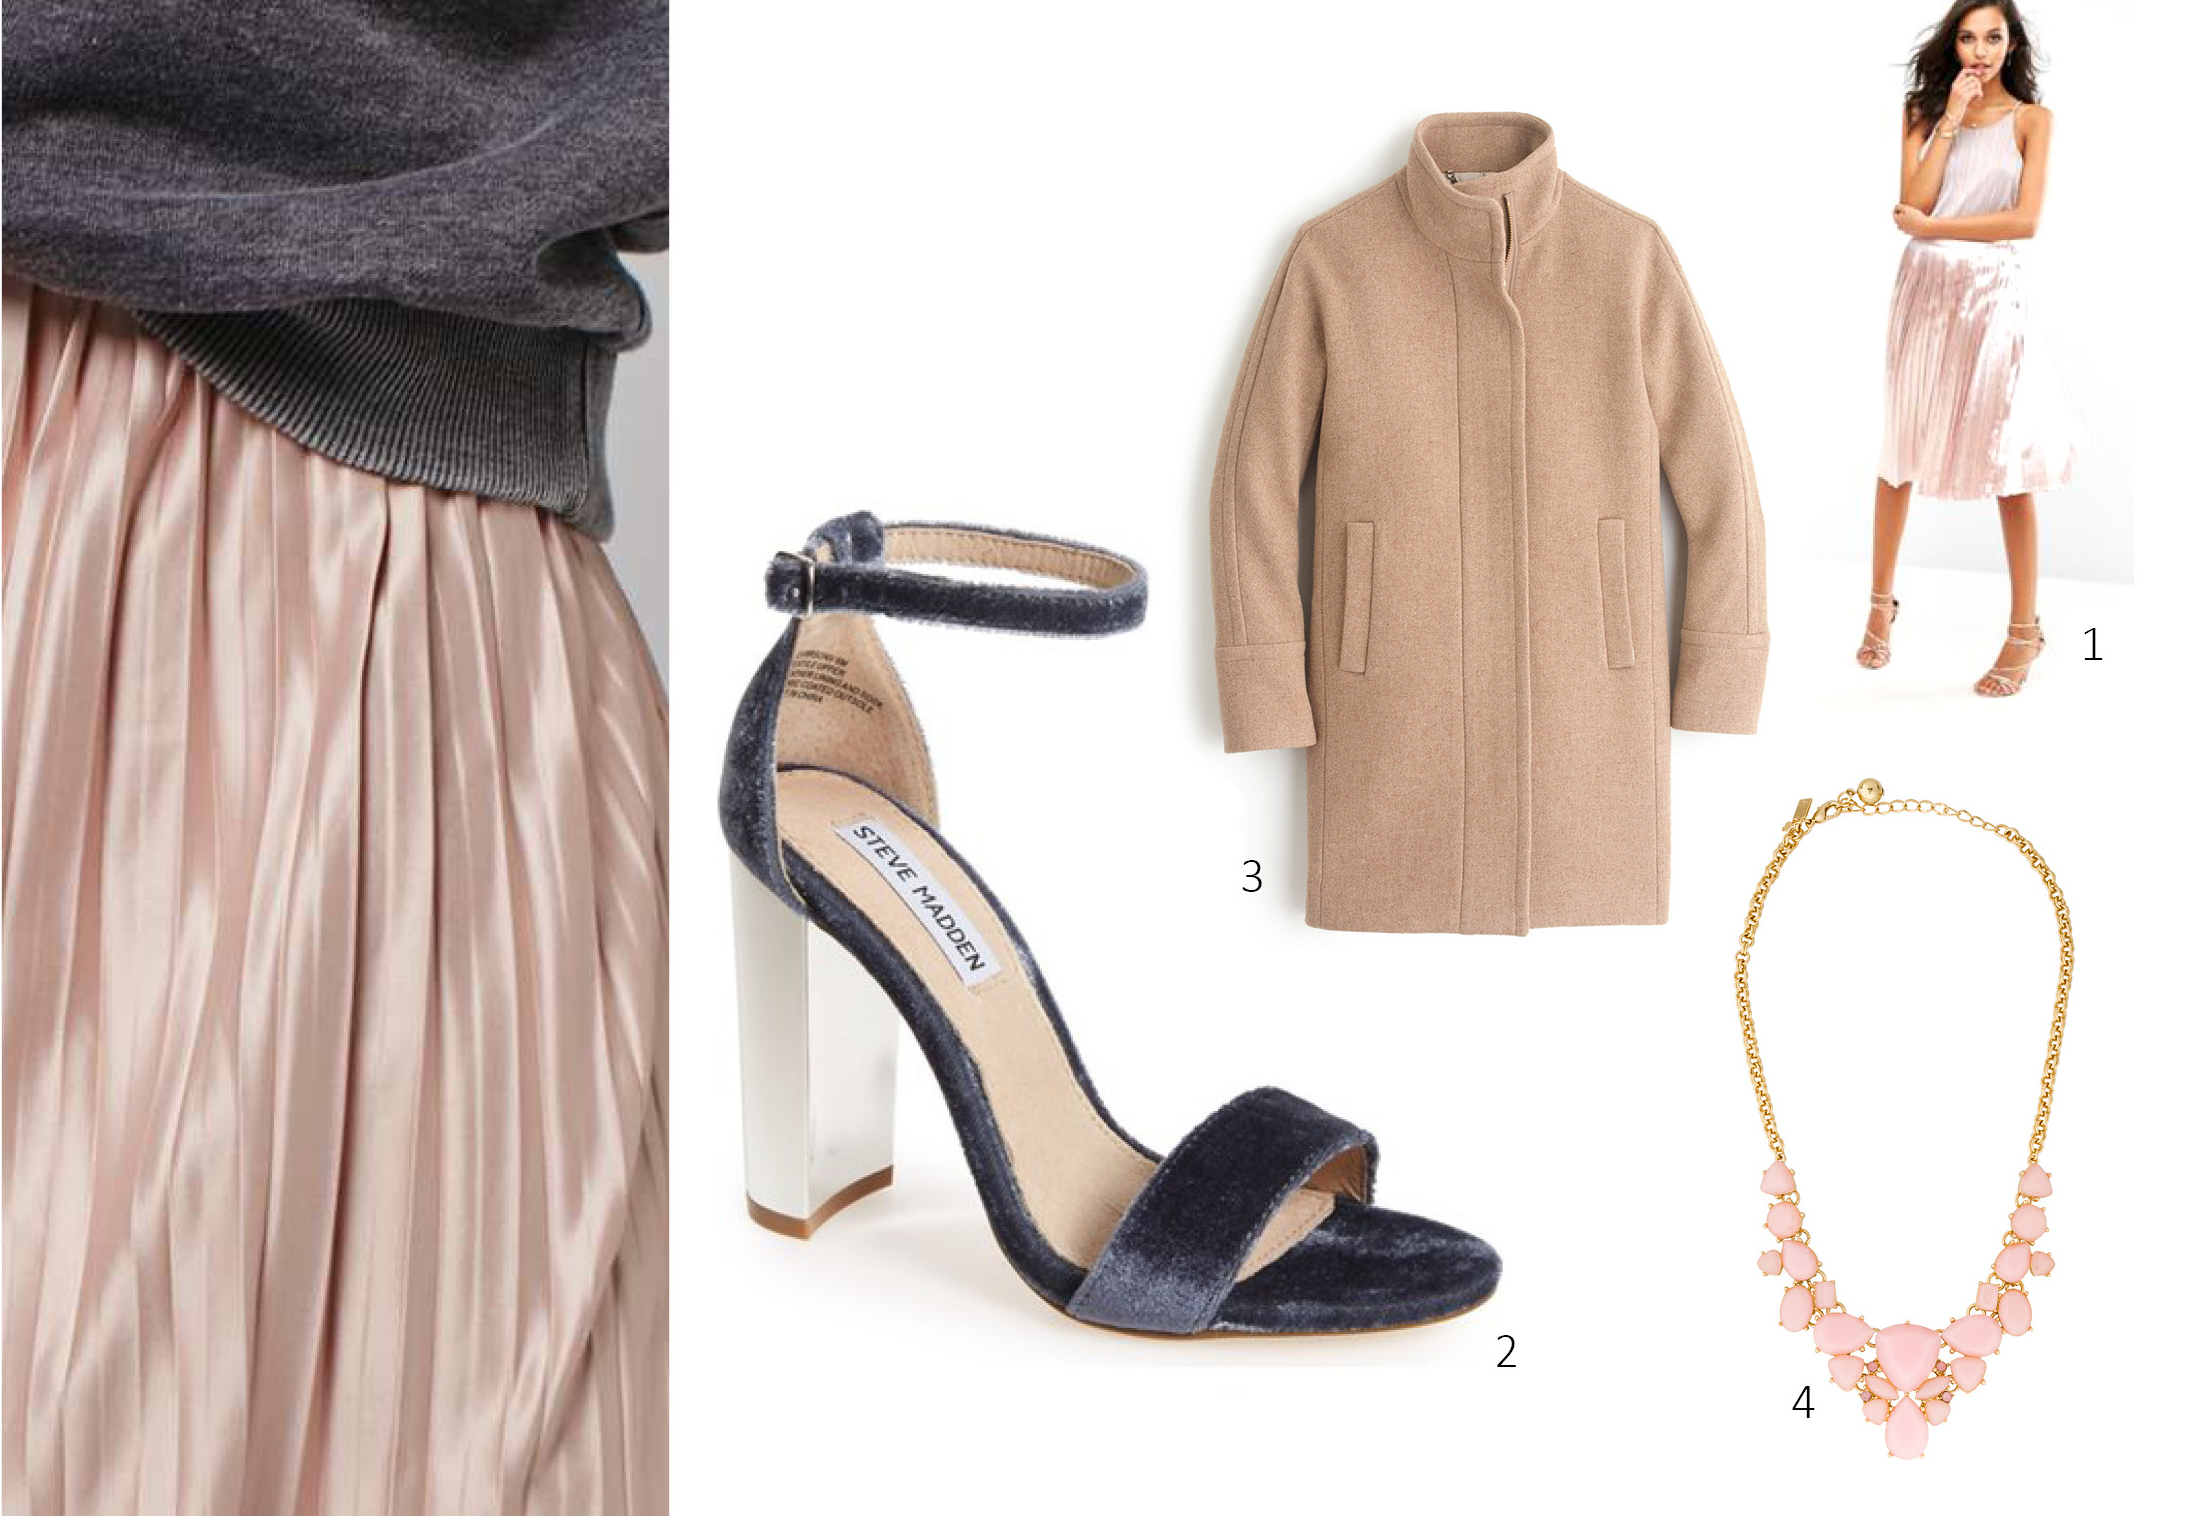 1. ASOS BooHoo Slinky Metallic Midi Skirt, $35; 2. Steve Madden, $99; 3. J Crew Stadium Cloth Cocoon Coat, $350; 4. Kate Spade $75